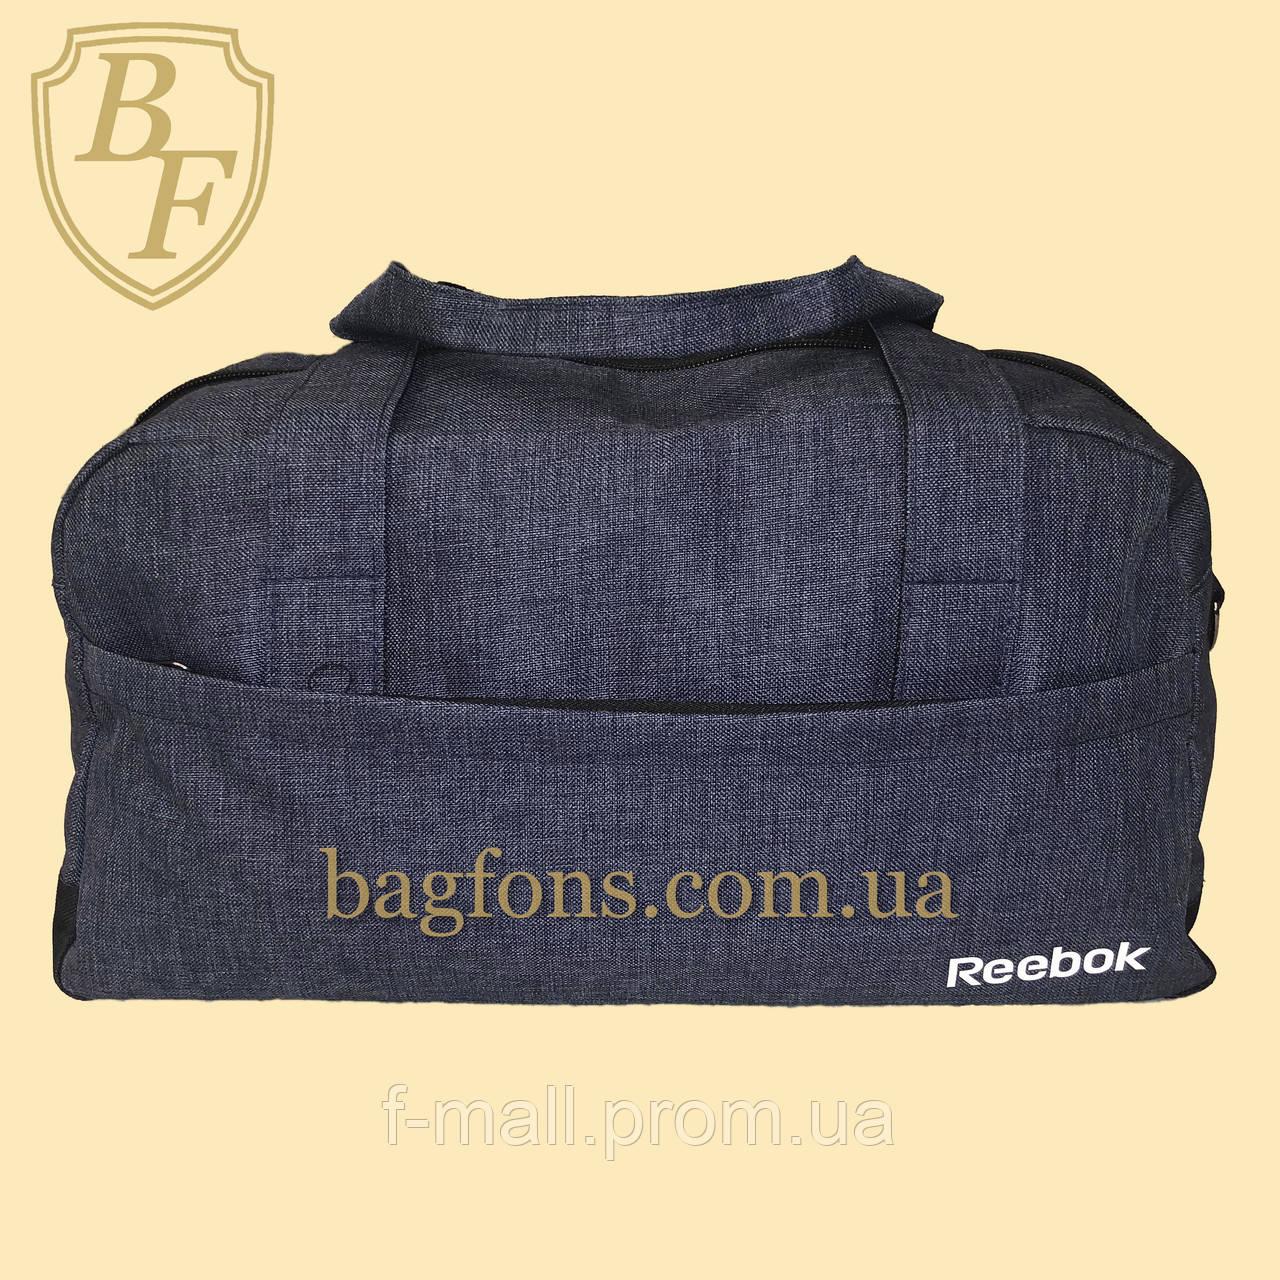 Дорожная спортивная сумка  REEBOK -20л.